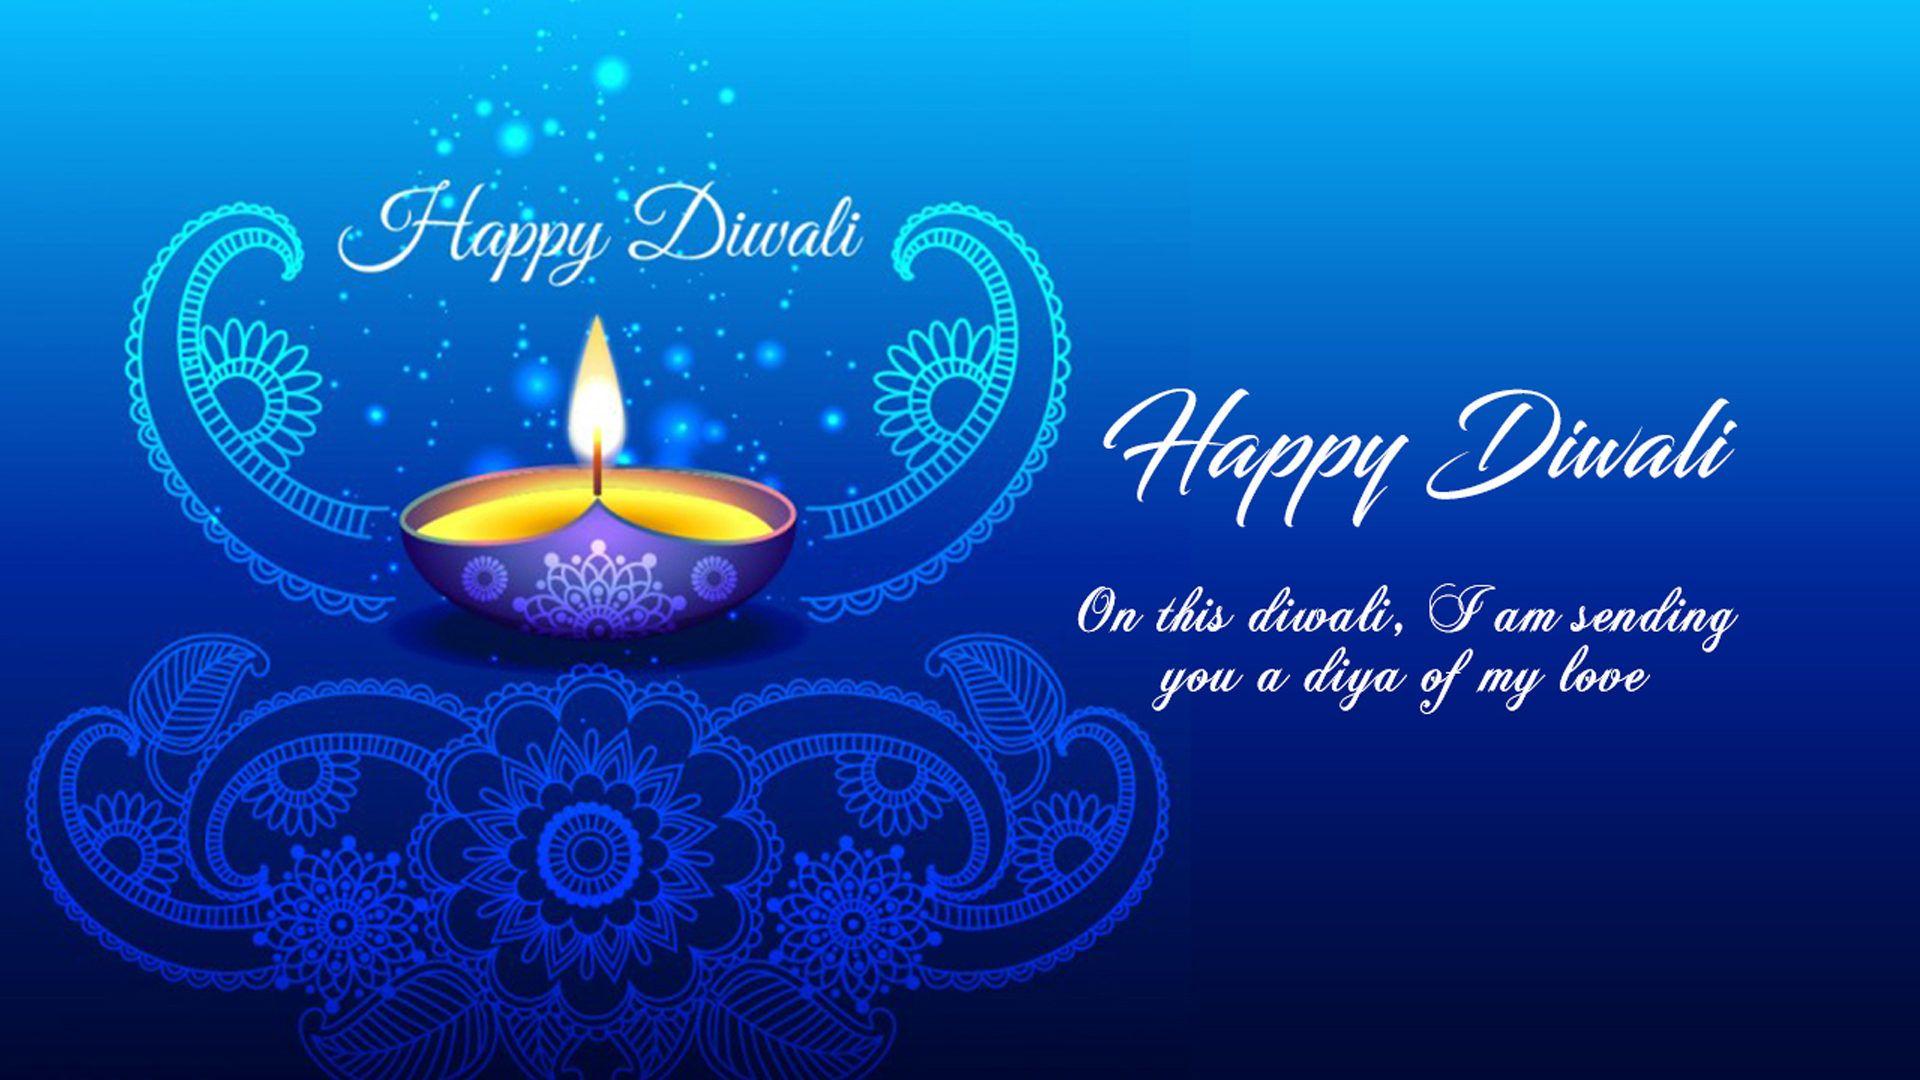 happy diwali images greetings